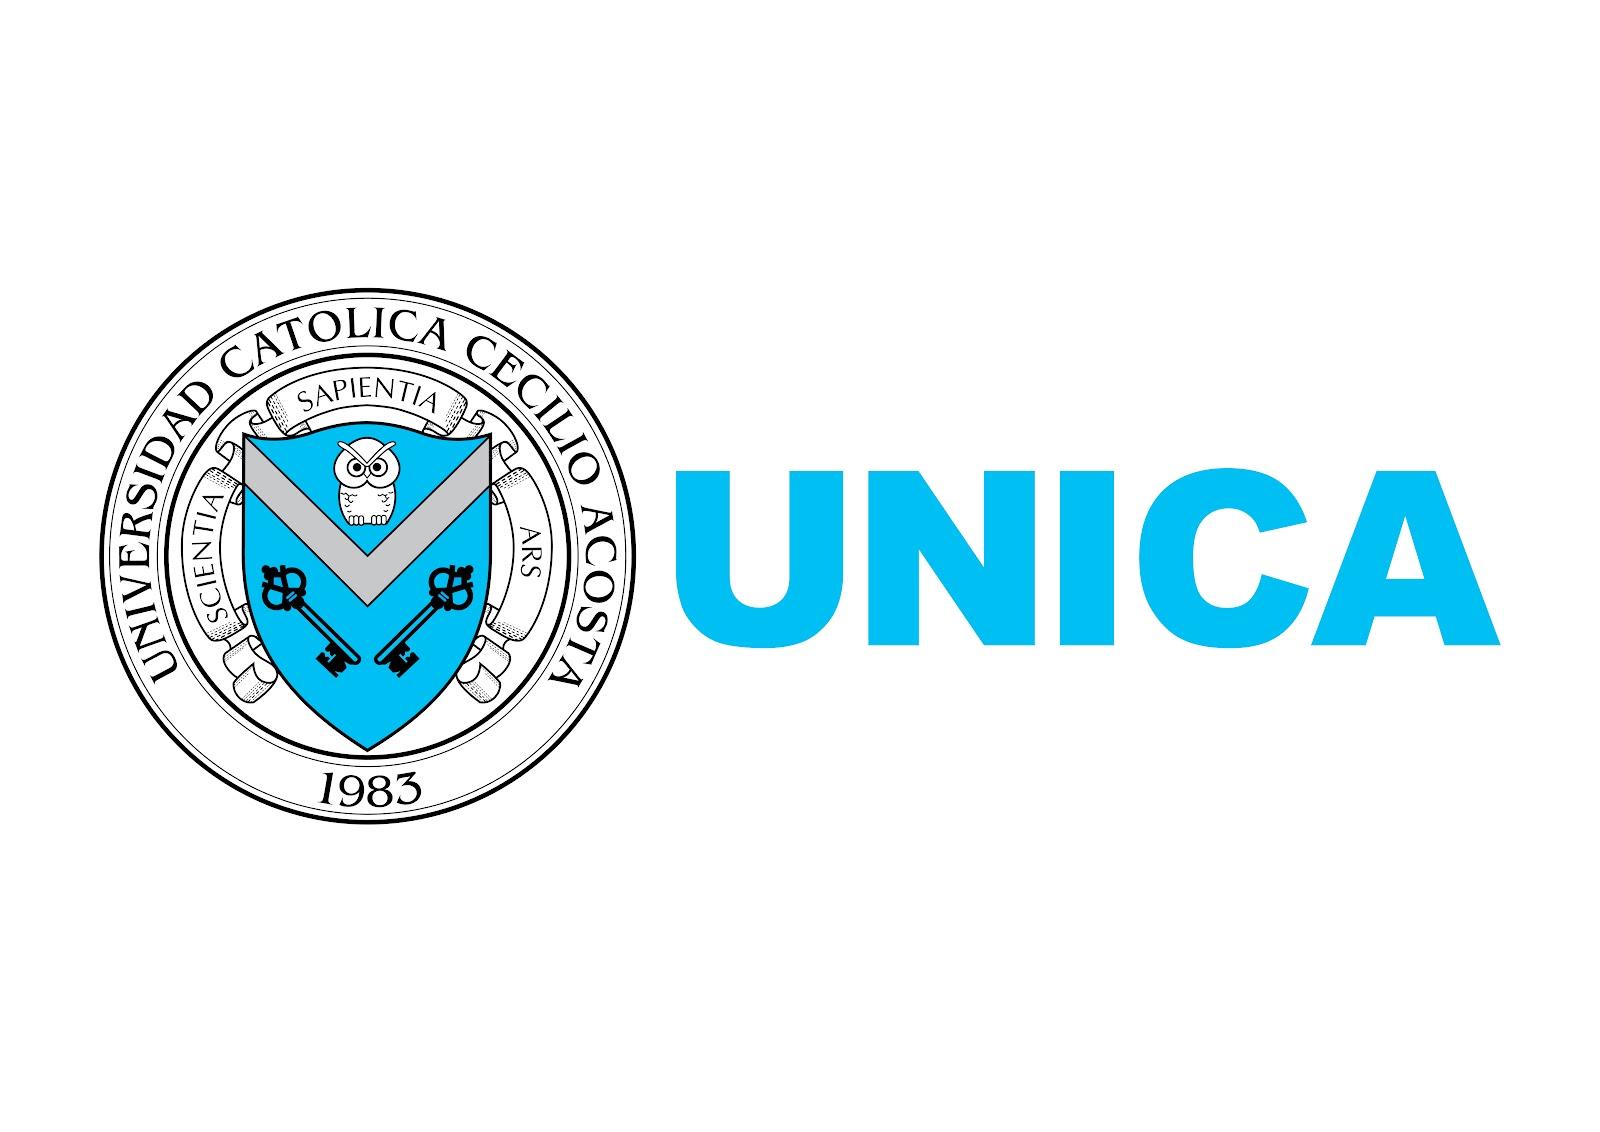 UNICA - Universidad Católica Cecilio Acosta